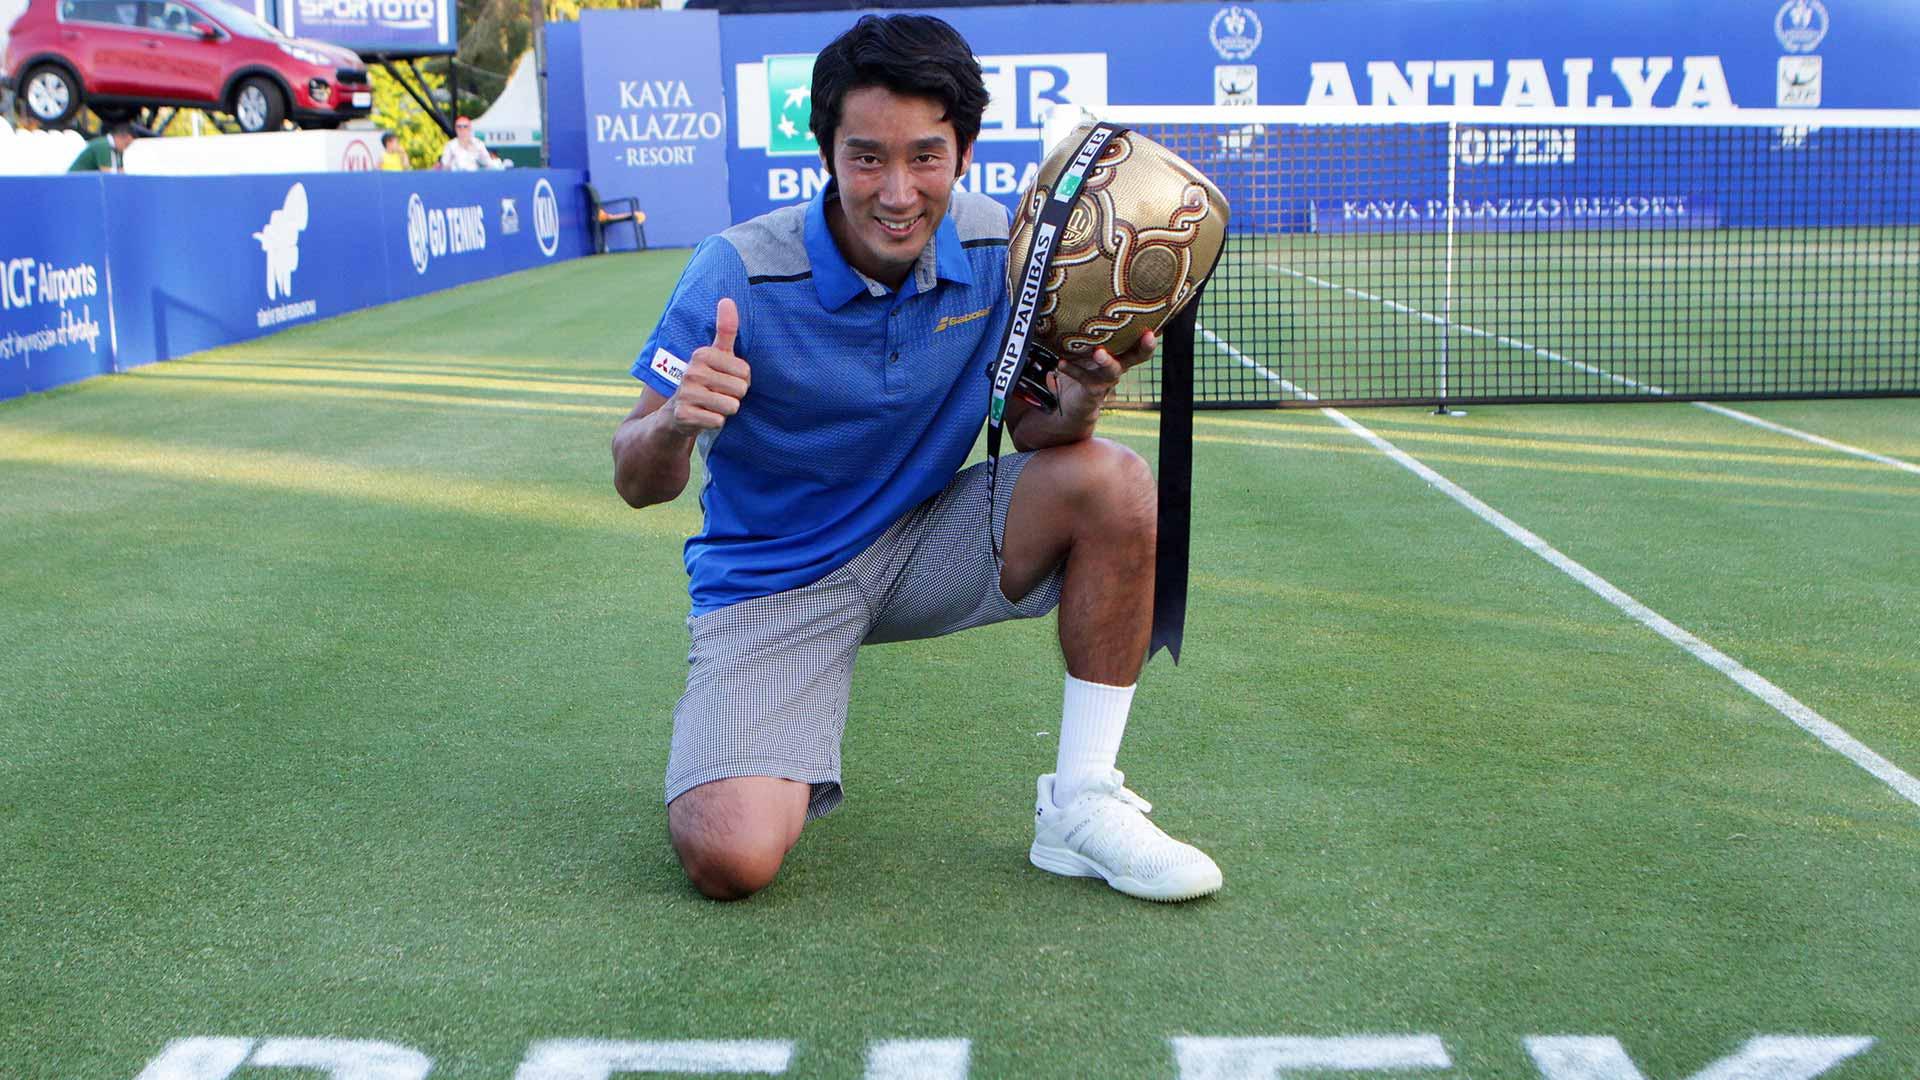 Yuichi Sugita ATP Antalya